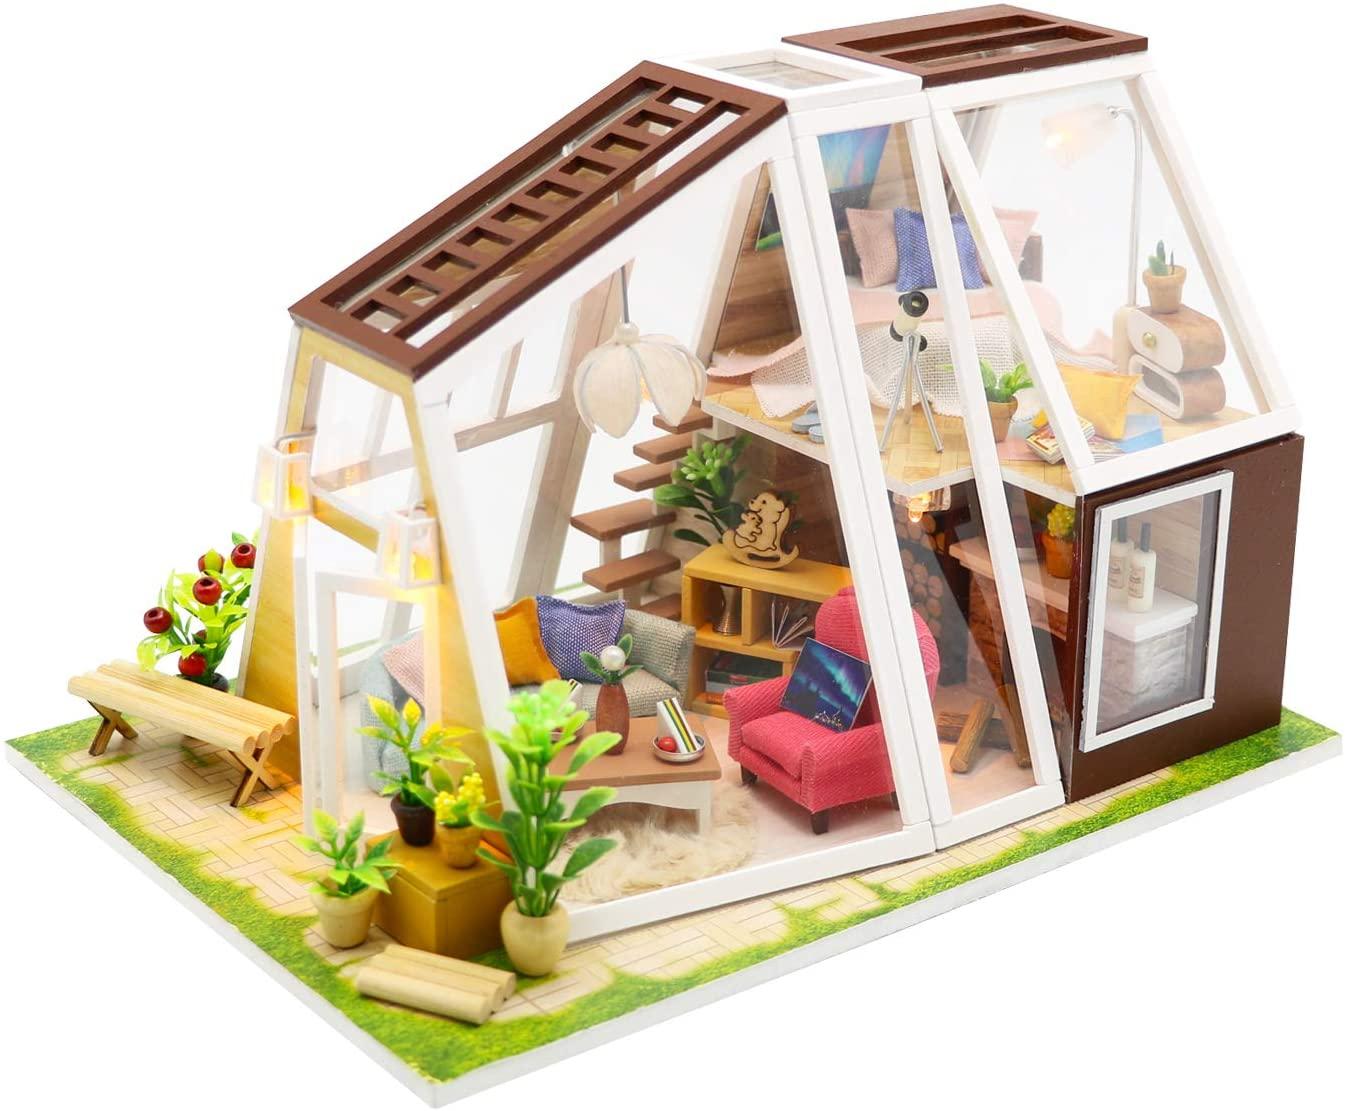 Flever Dollhouse Miniature DIY House Kit Creative Room with Furniture for Romantic Artwork Gift-Aurora Hut